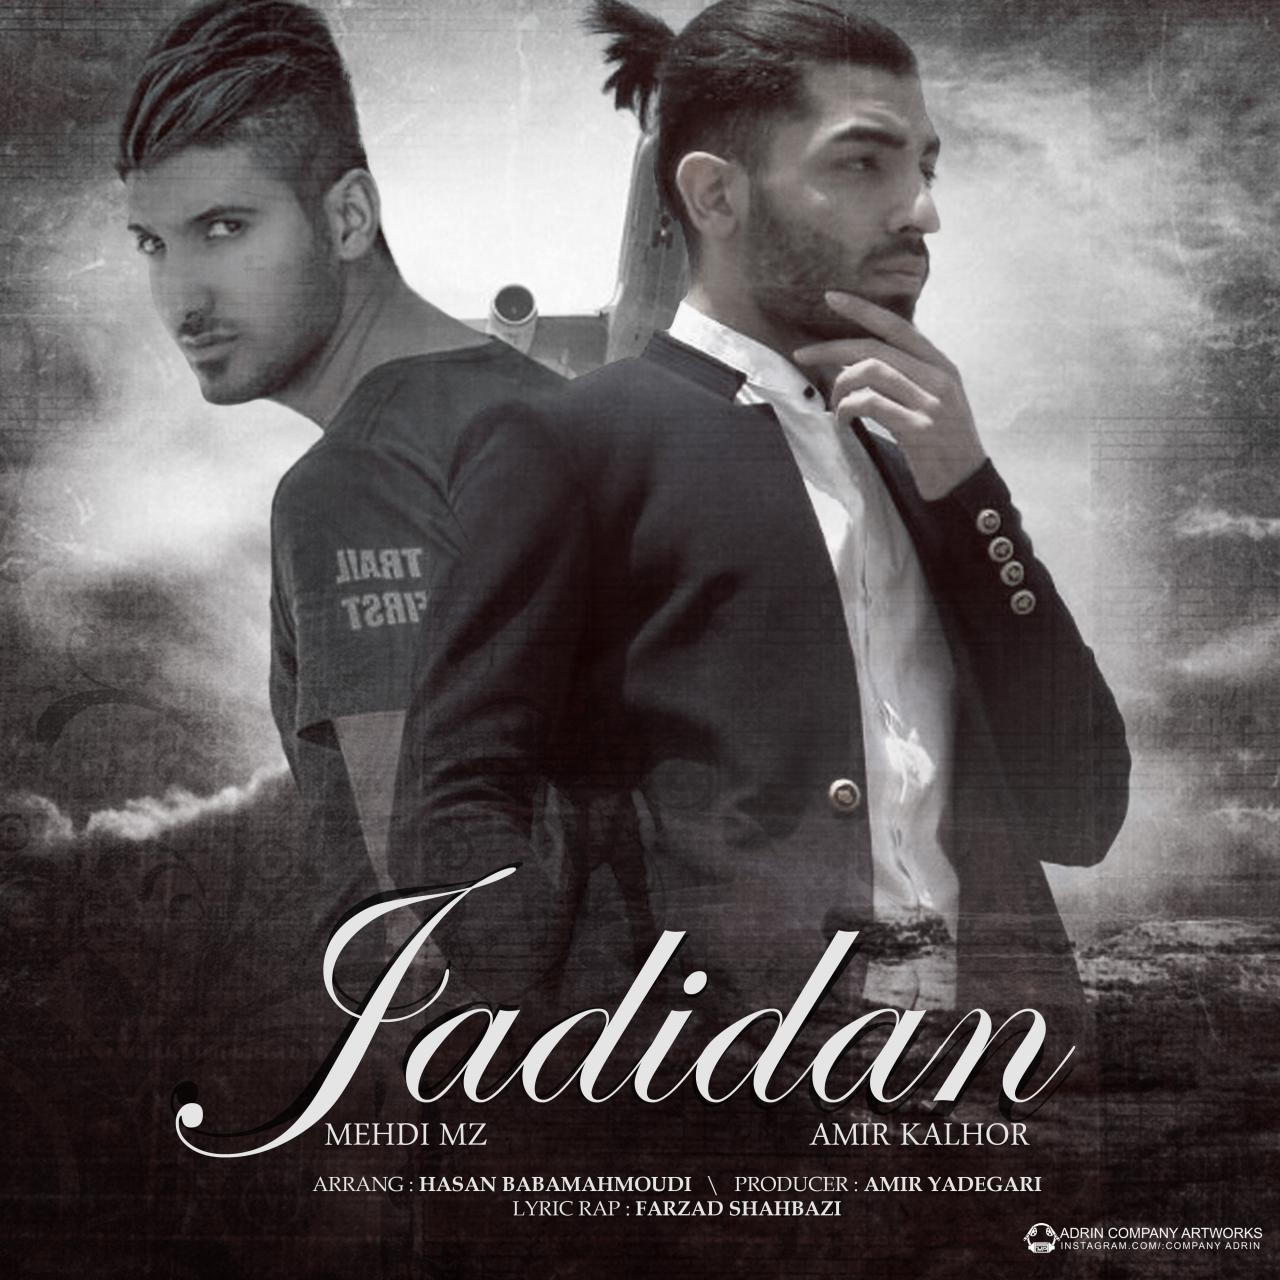 Amir Kalhor – Jadidan (Ft Mehdi MZ)